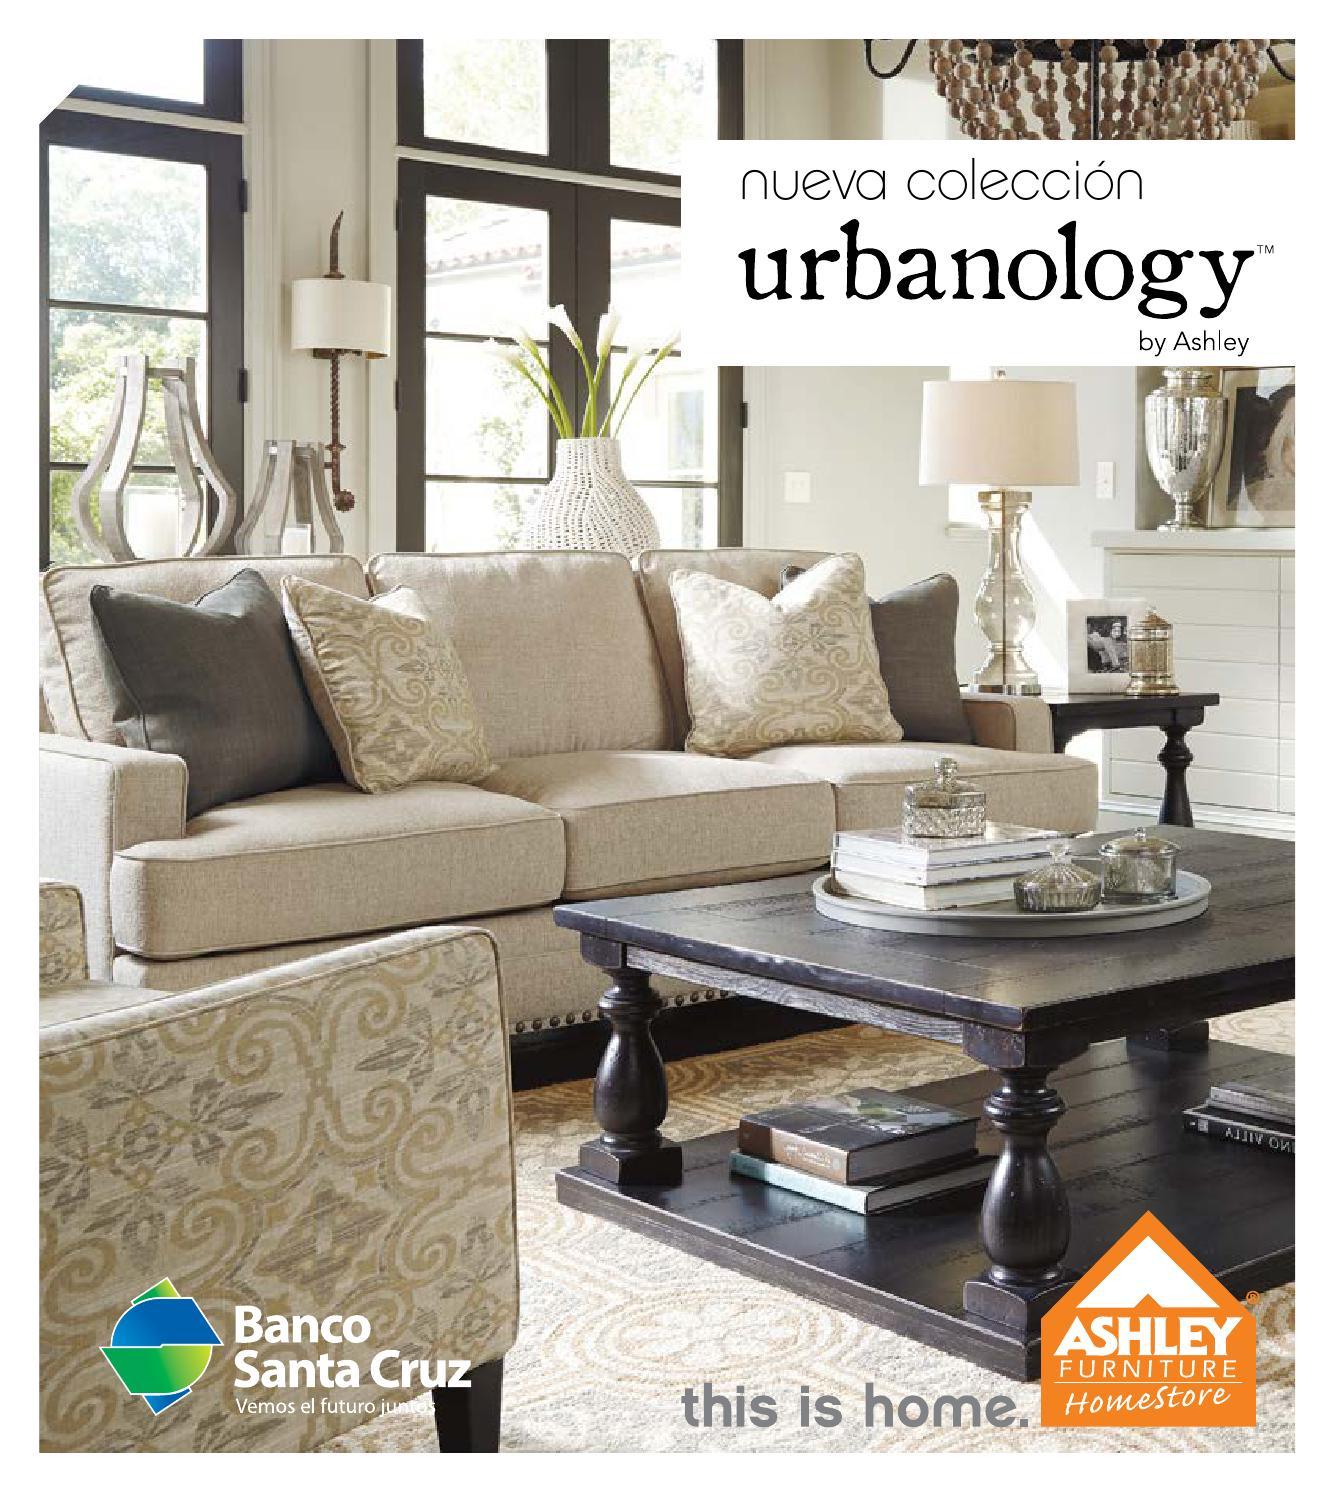 Homestore Inc: Urbanology By Ashley By Ashley Furniture HomeStore RD